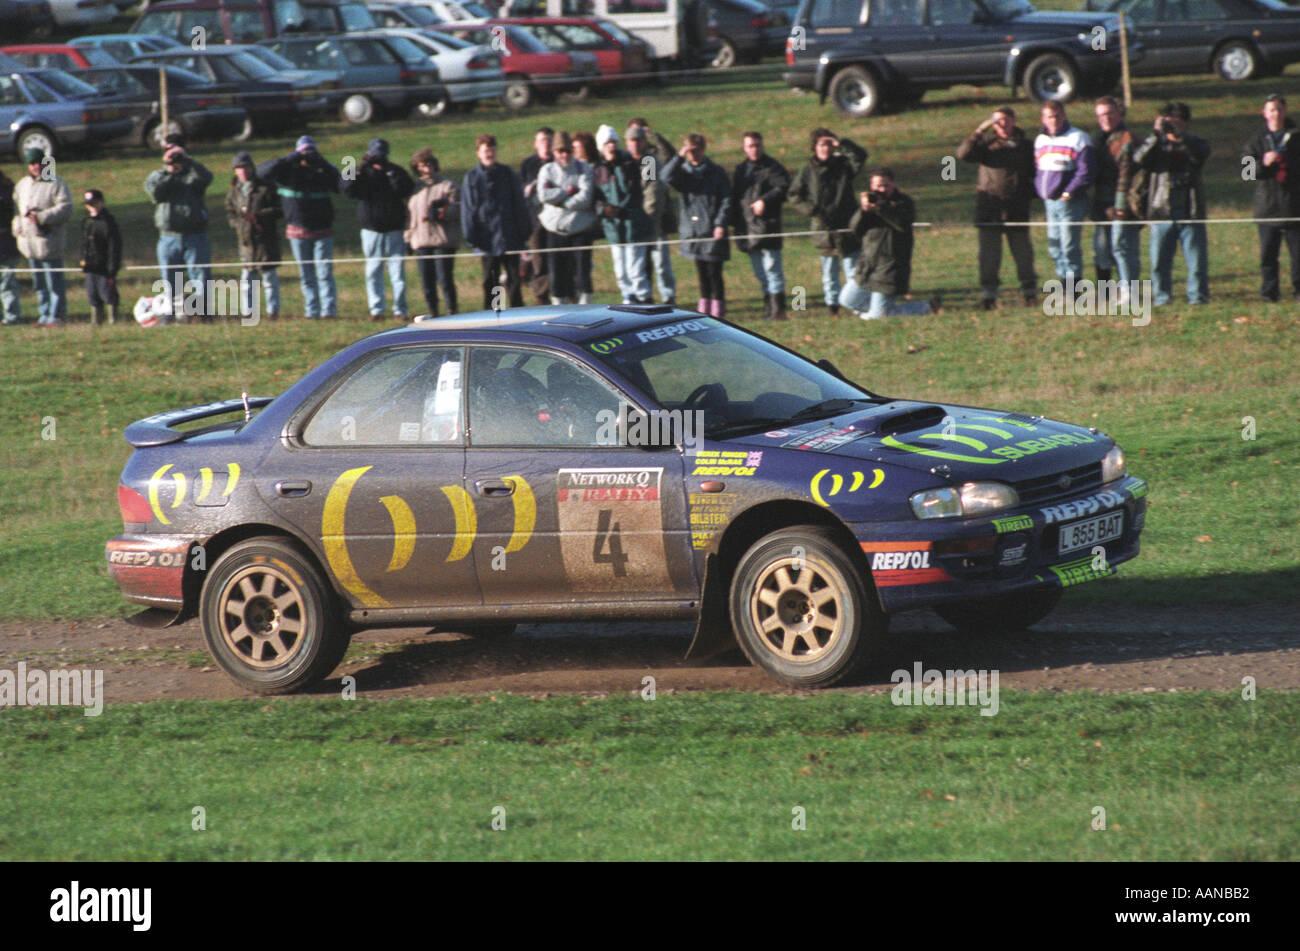 Rac Rally Stock Photos & Rac Rally Stock Images - Alamy